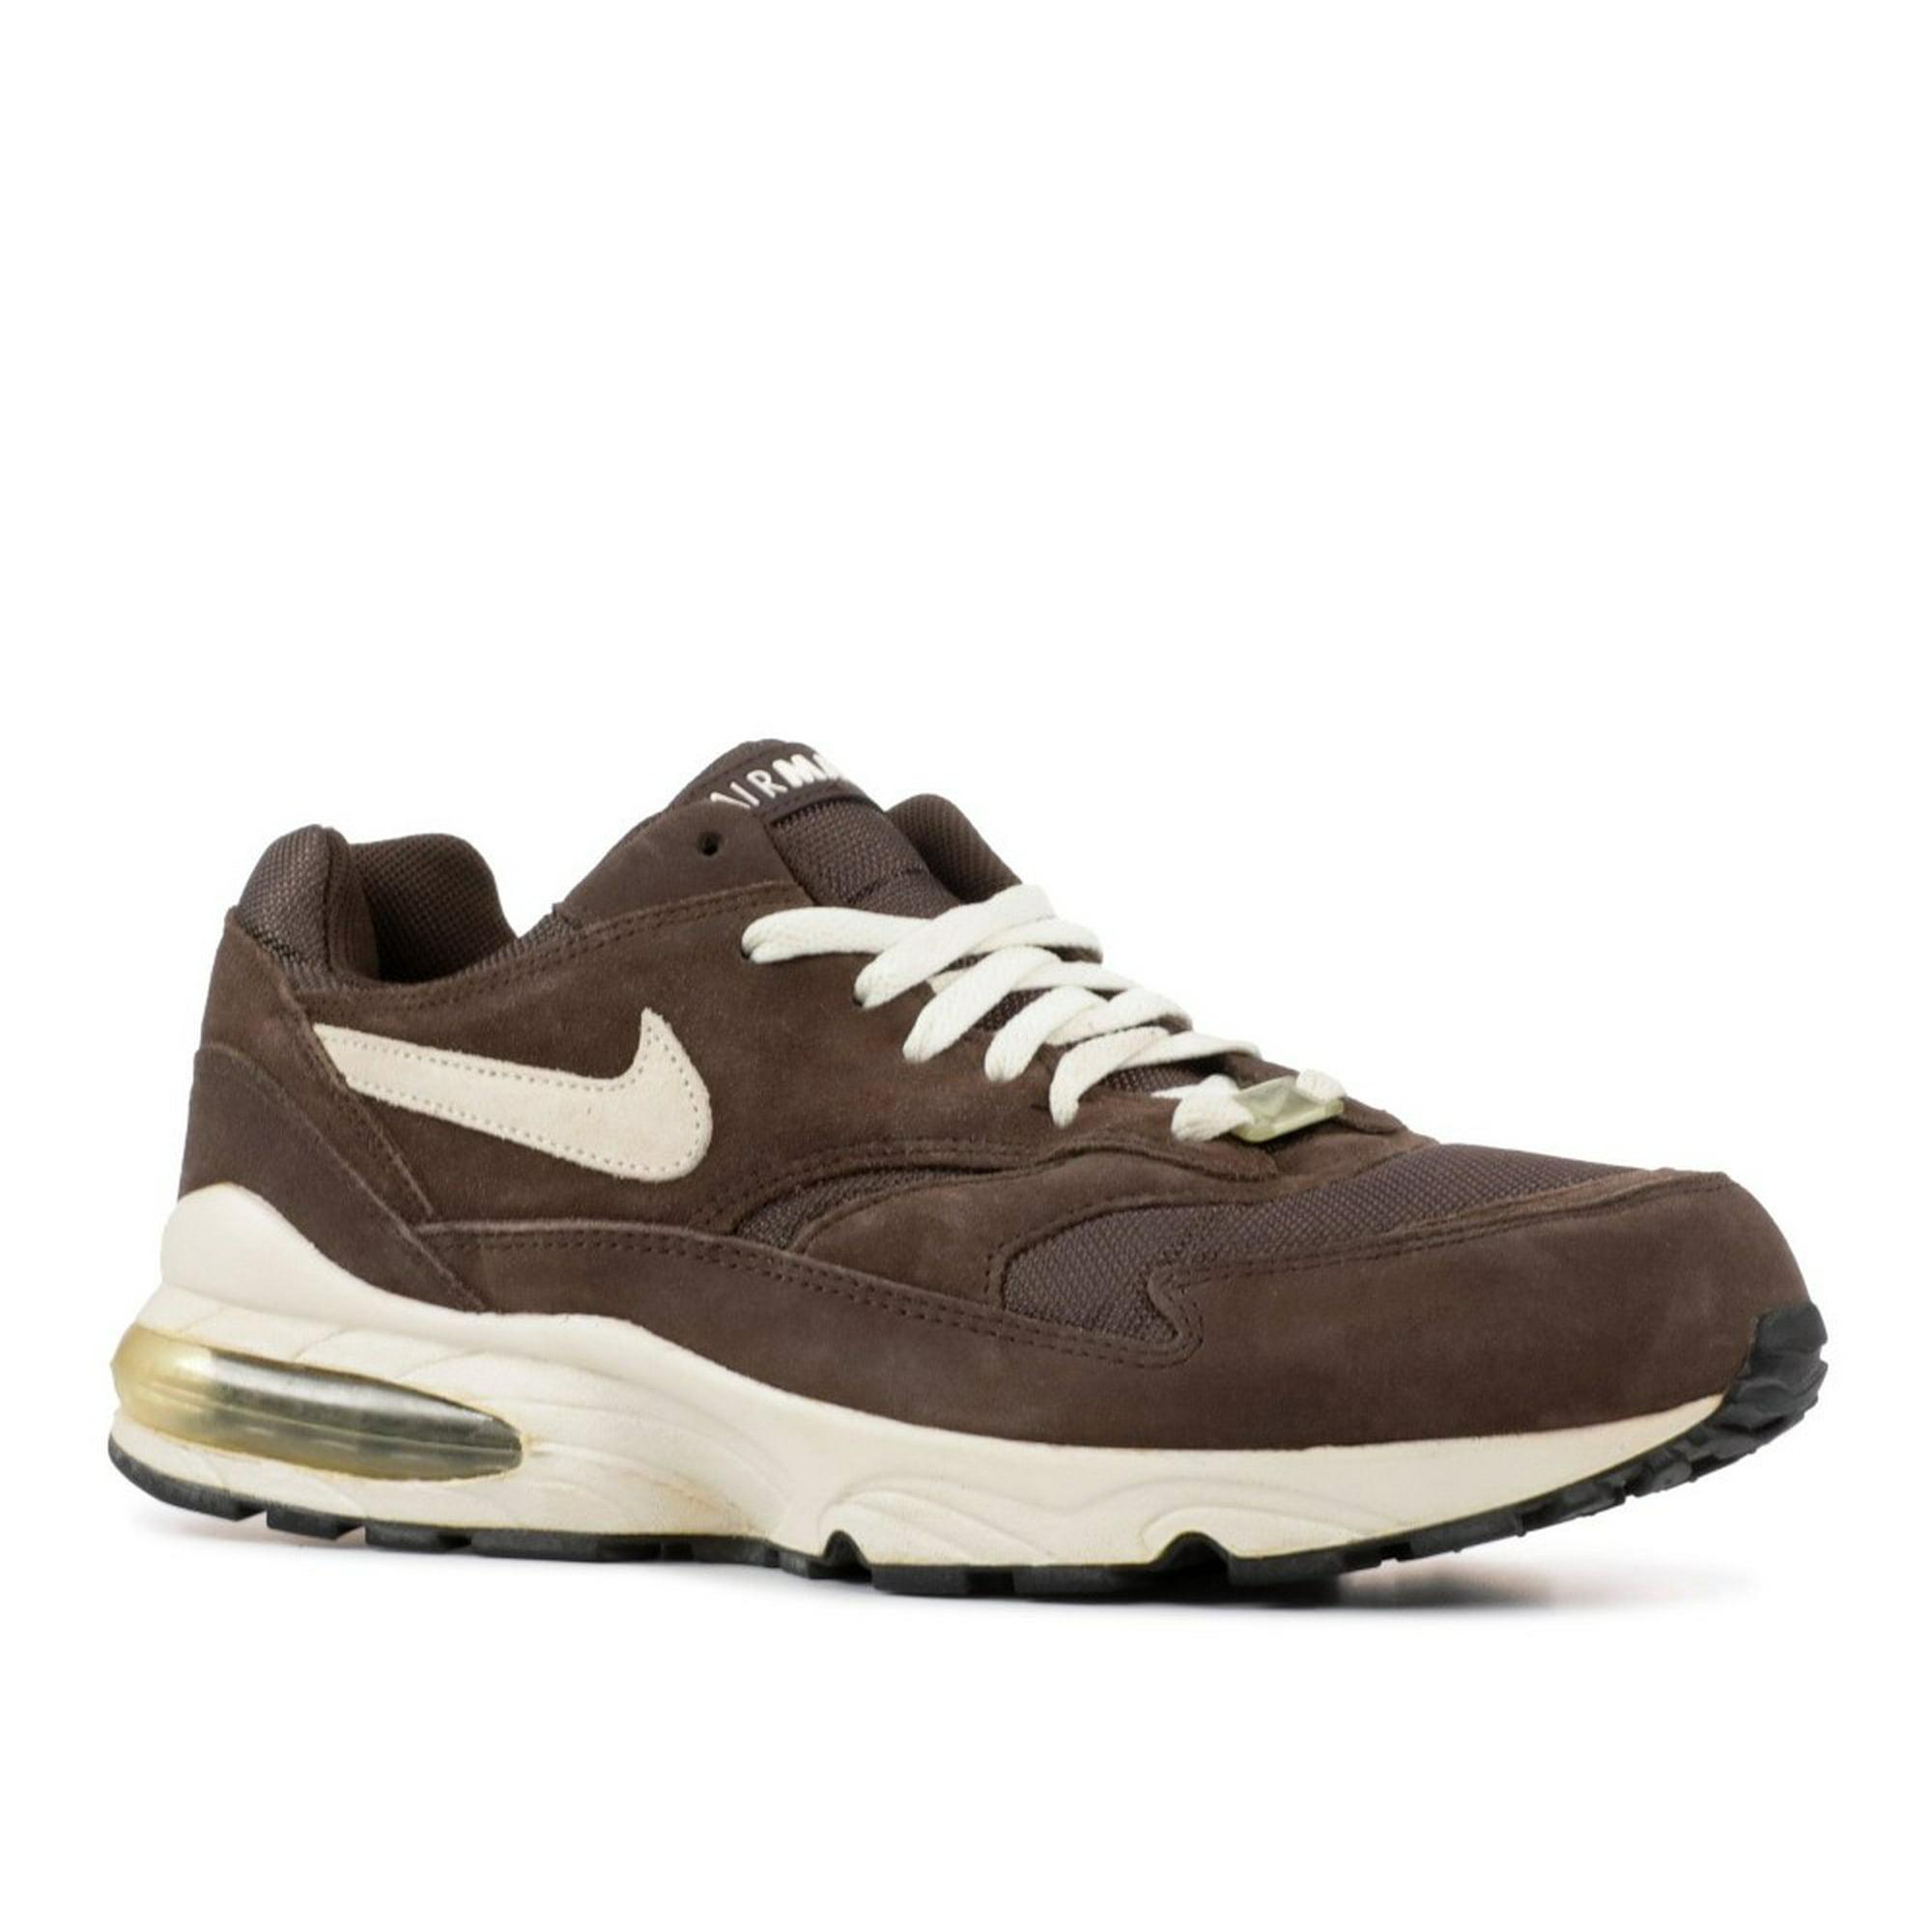 Nike Men Air Max 95 Premium Se 924478 003 Size 10